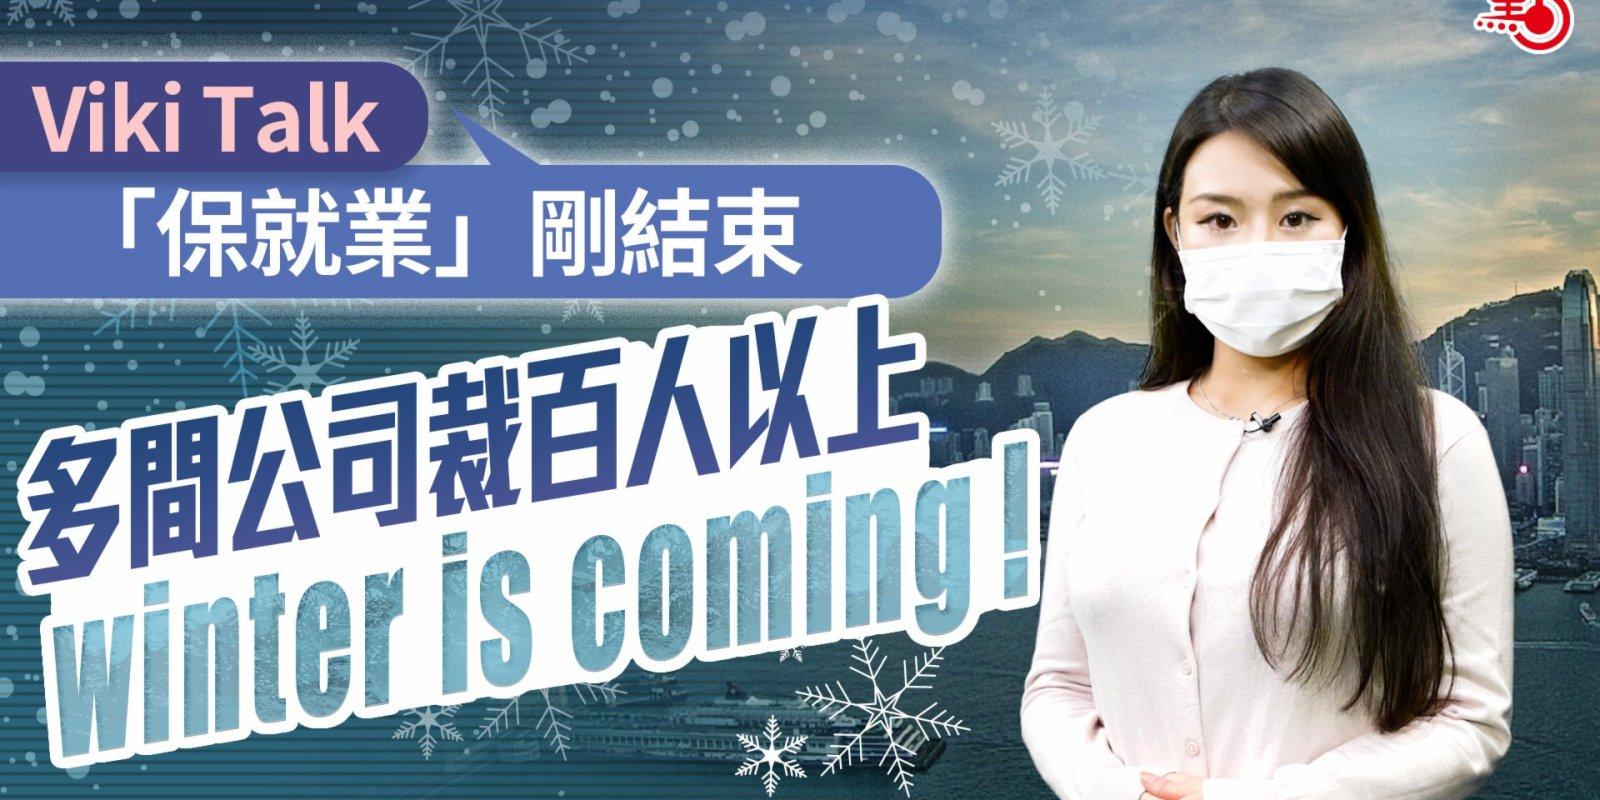 Viki Talk   「保就業」剛結束 多間公司裁百人以上 Winter is coming!